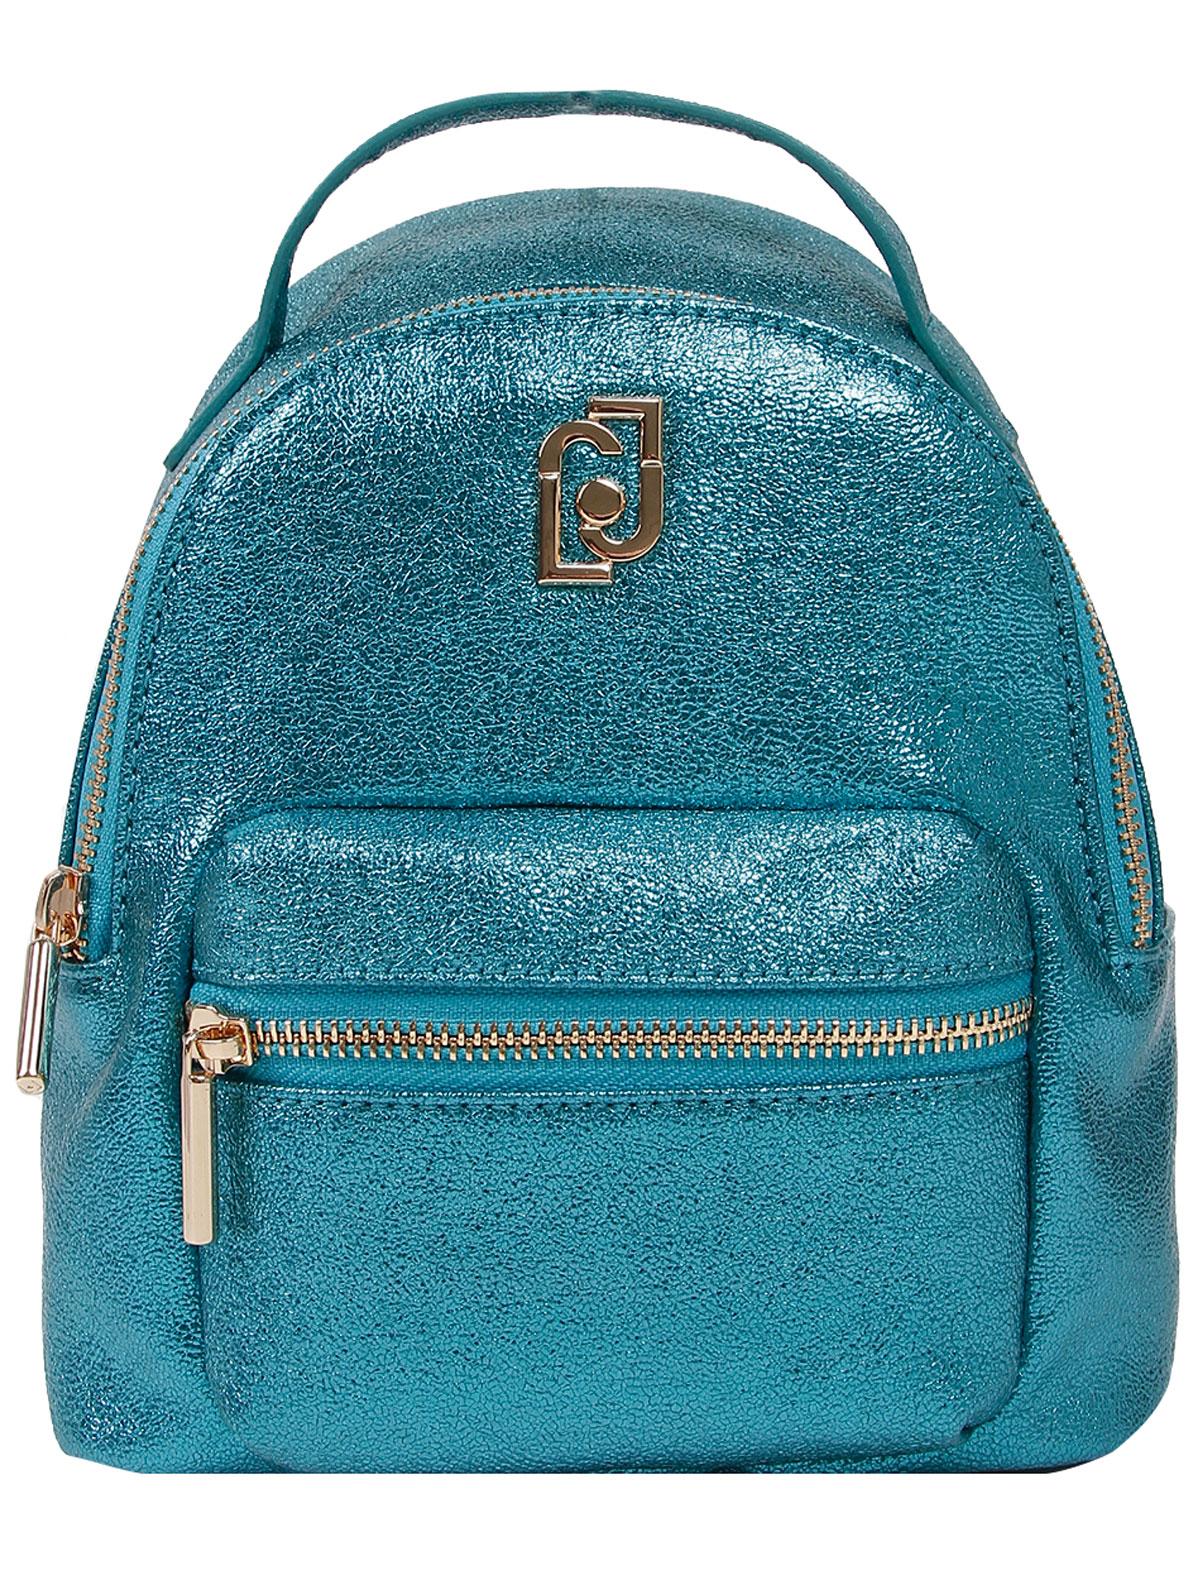 Рюкзак Liu Jo Junior 2297036 голубого цвета